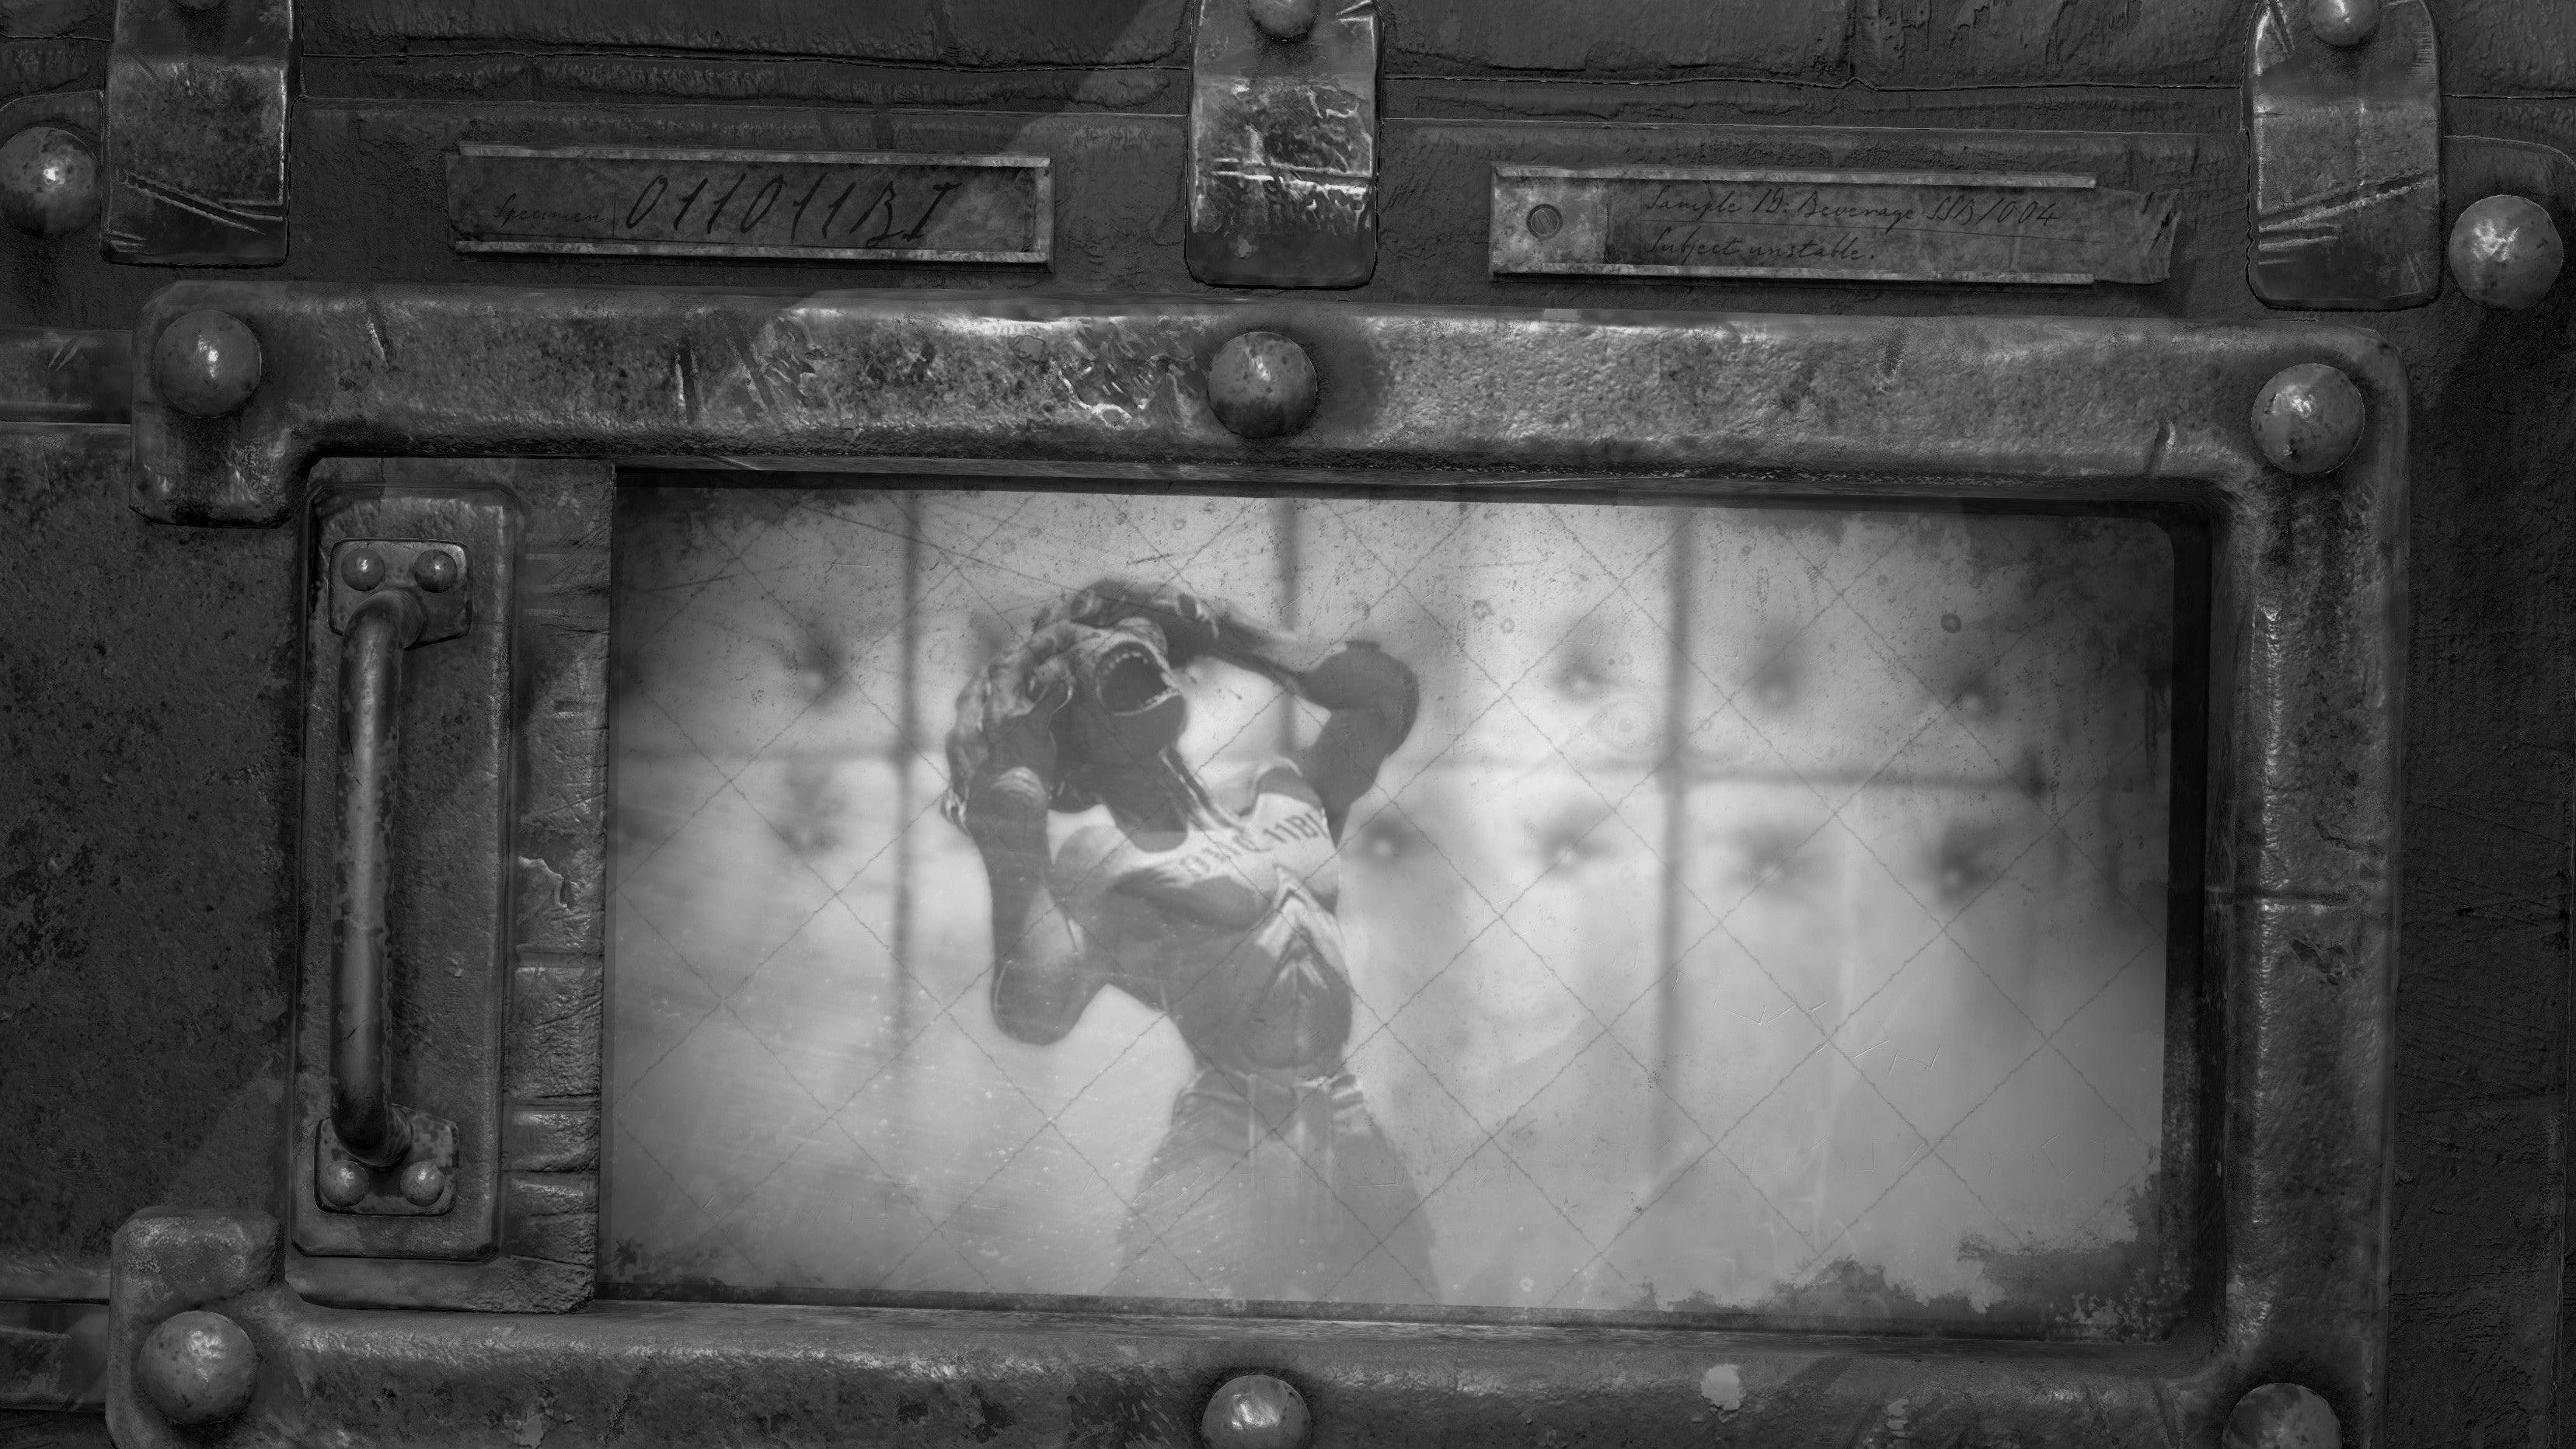 epic-games epic-games-store harassment oddworld oddworld-soulstorm